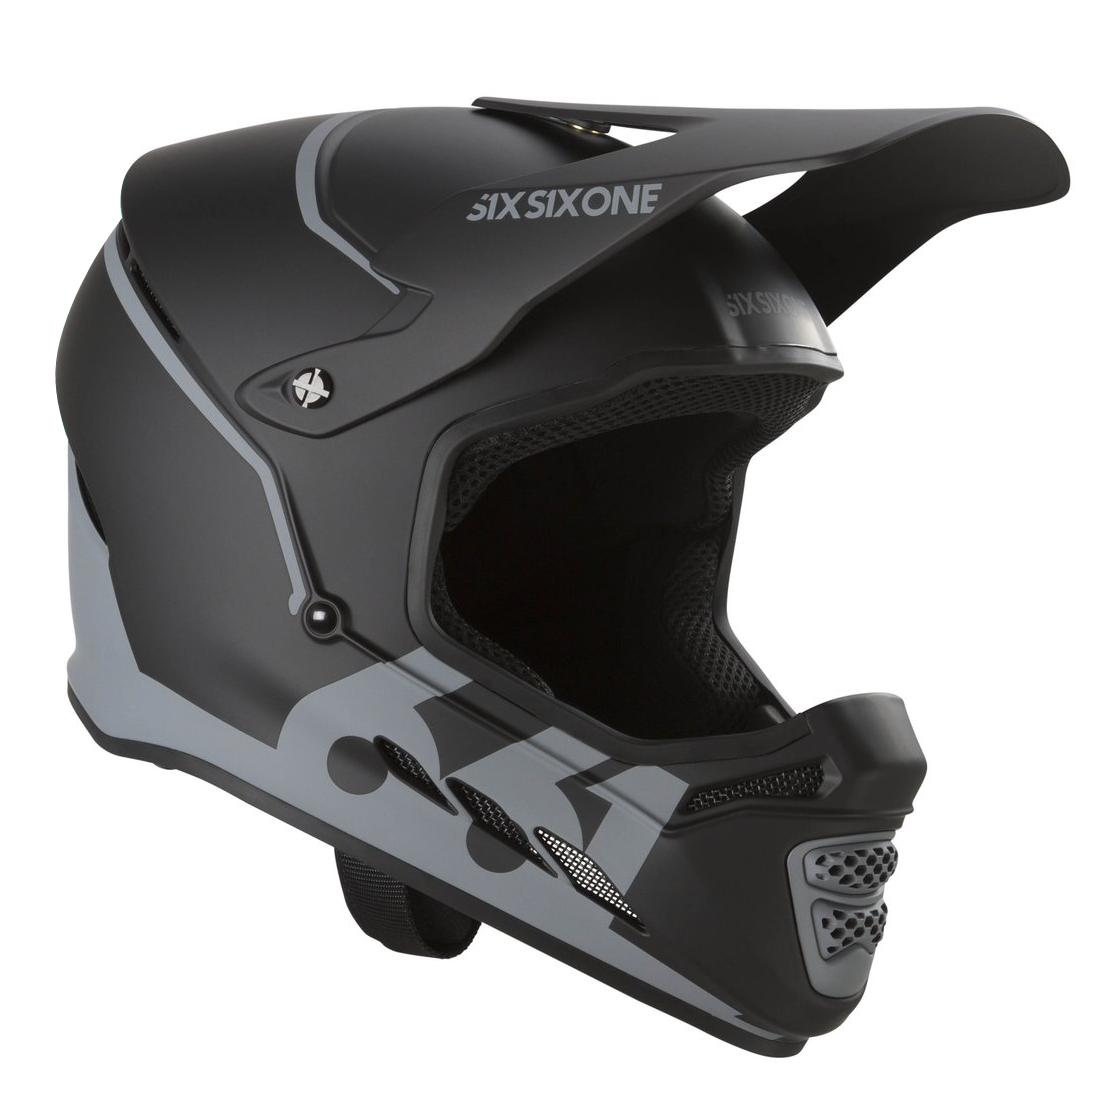 Image result for sixsixone helmet